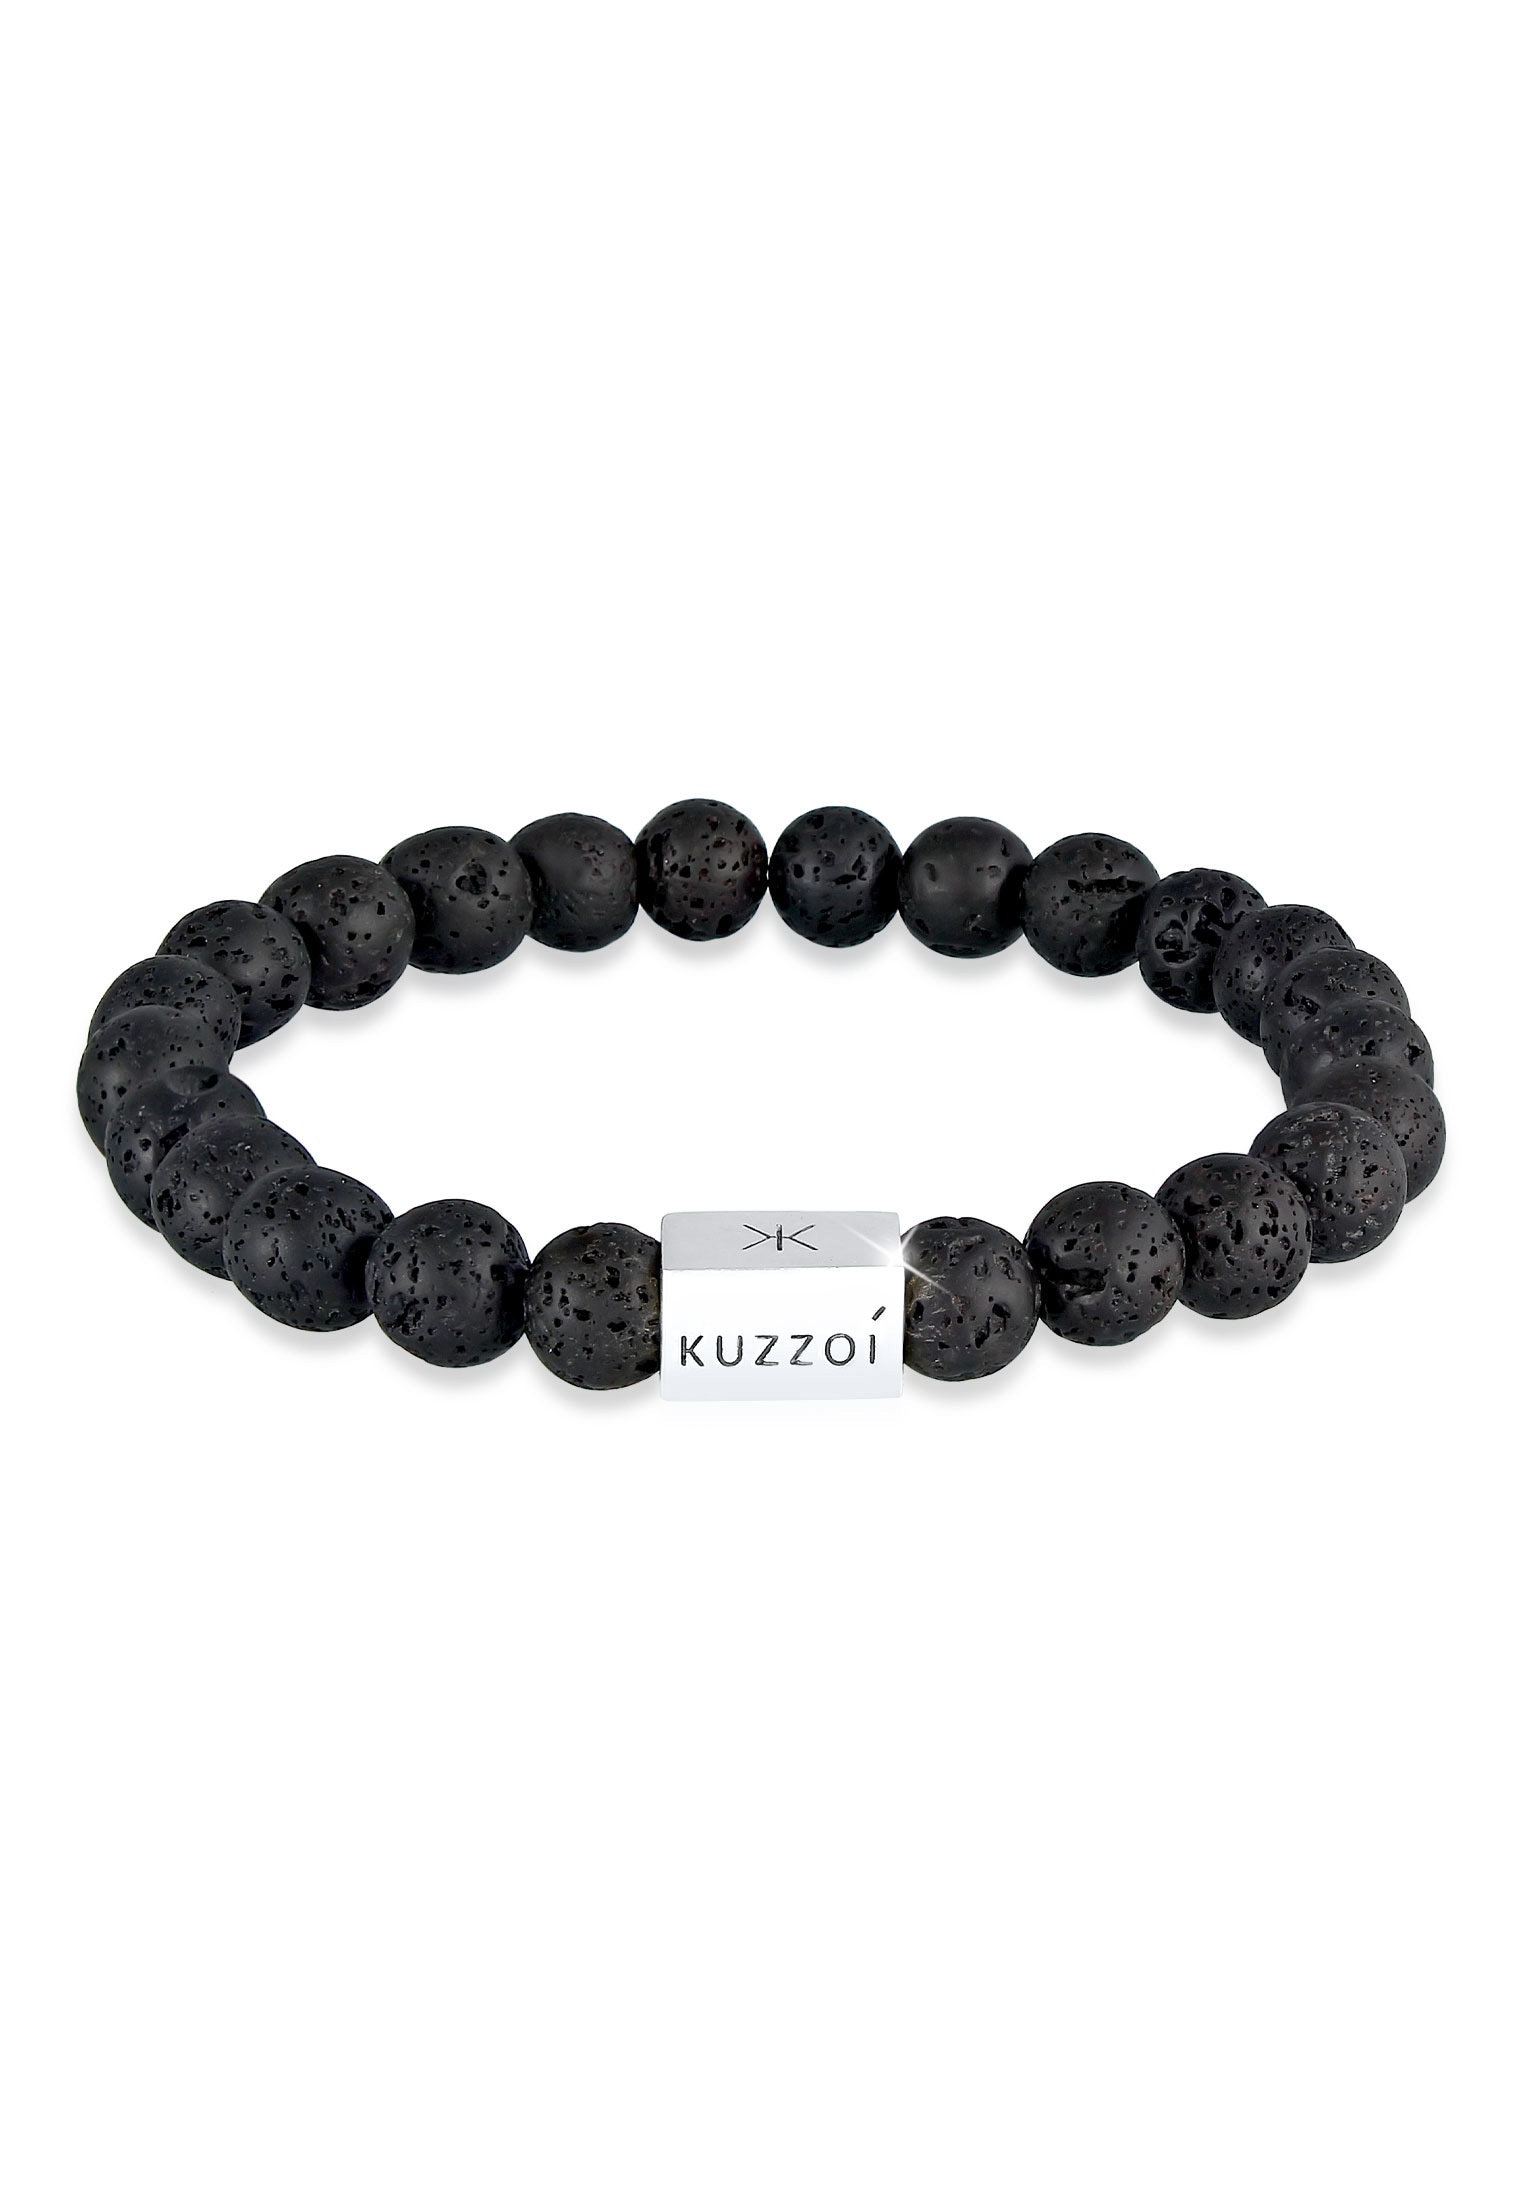 kuzzoi -  Armband Herren Lava Edelstein Bead Rechteck 925 Silber